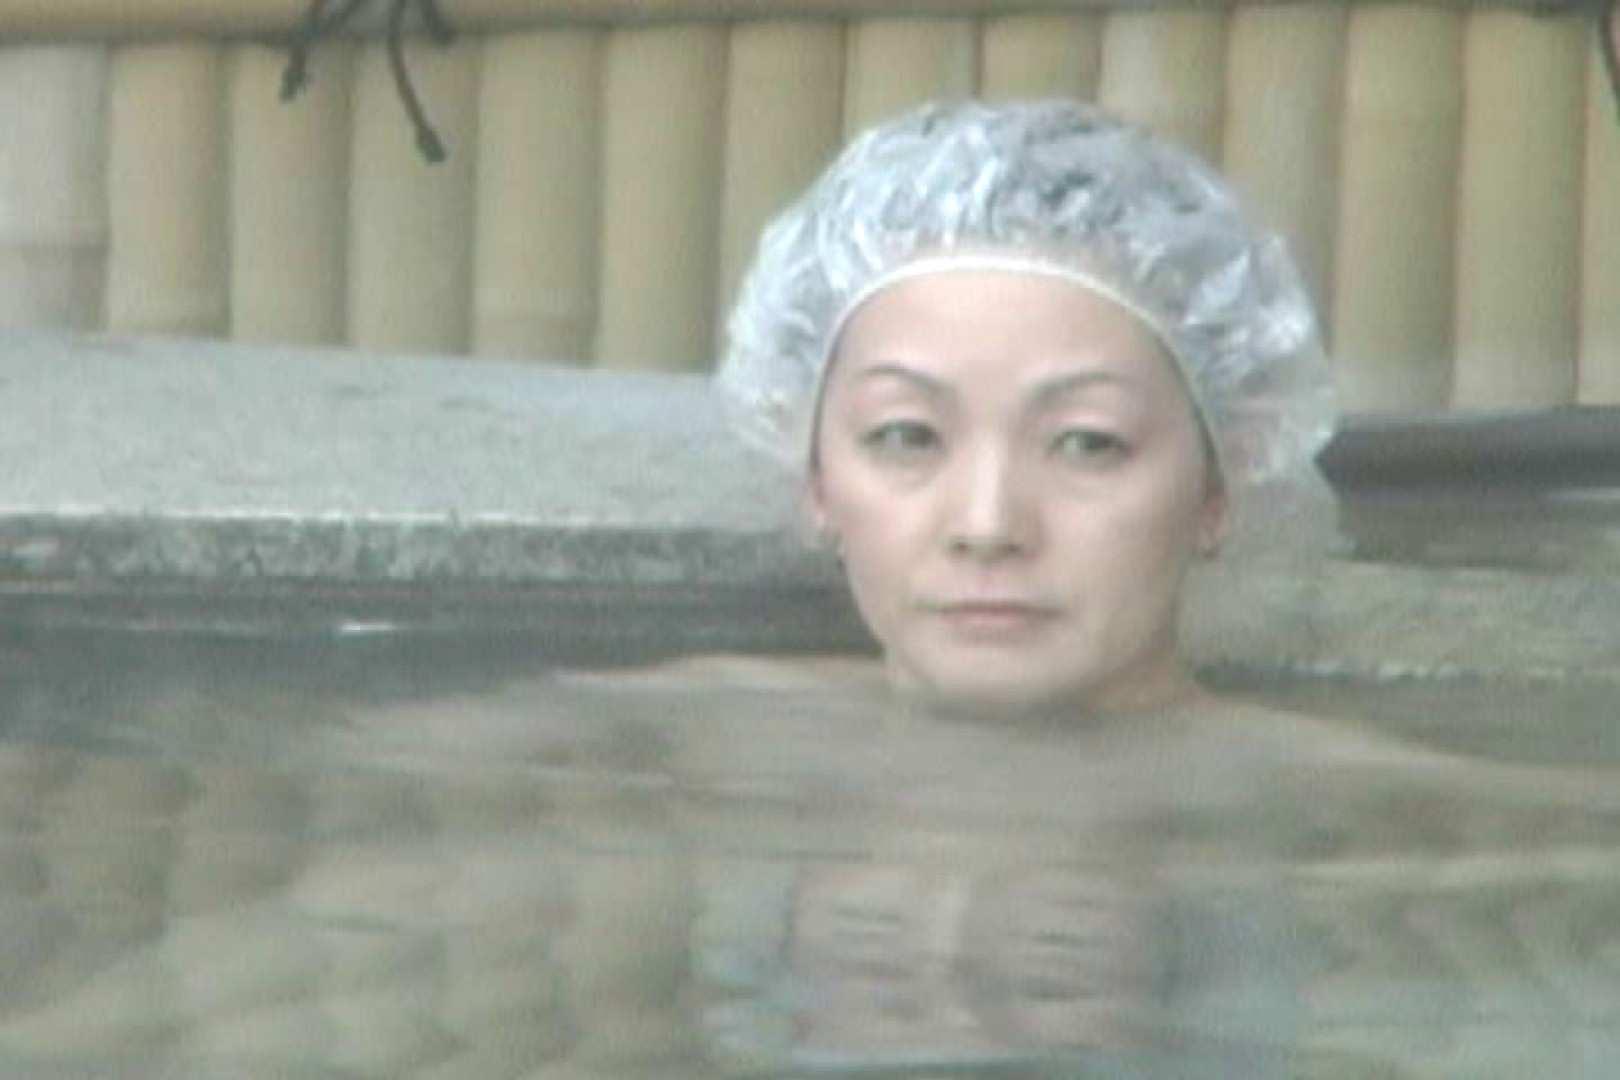 Aquaな露天風呂Vol.592 盗撮師作品  91pic 87